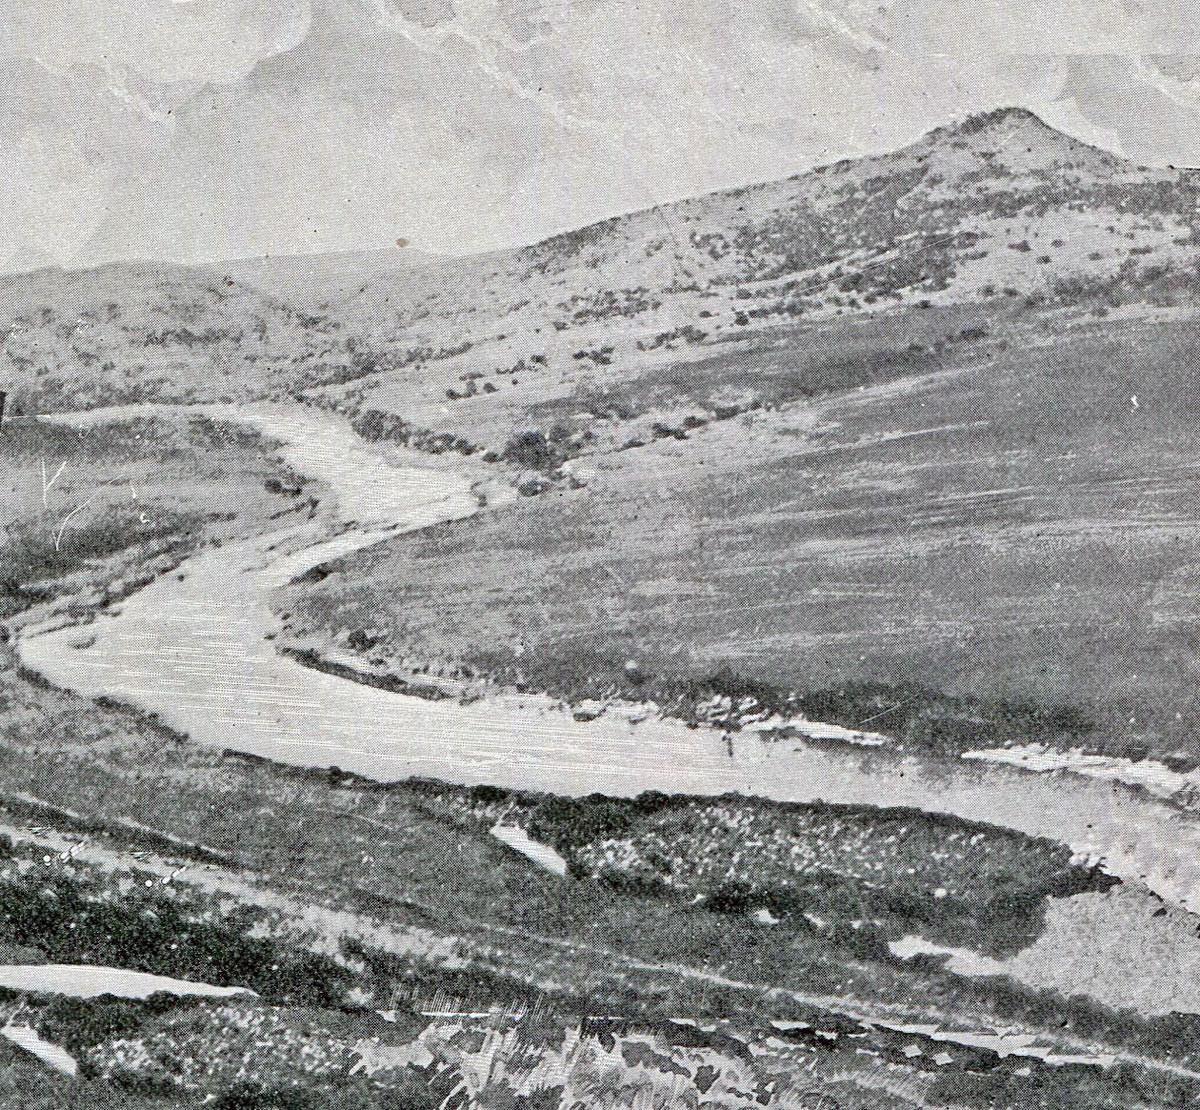 Val Krantz viewed across the Tugela River: Battle of Val Krantz on 5th February 1900 in the Great Boer War